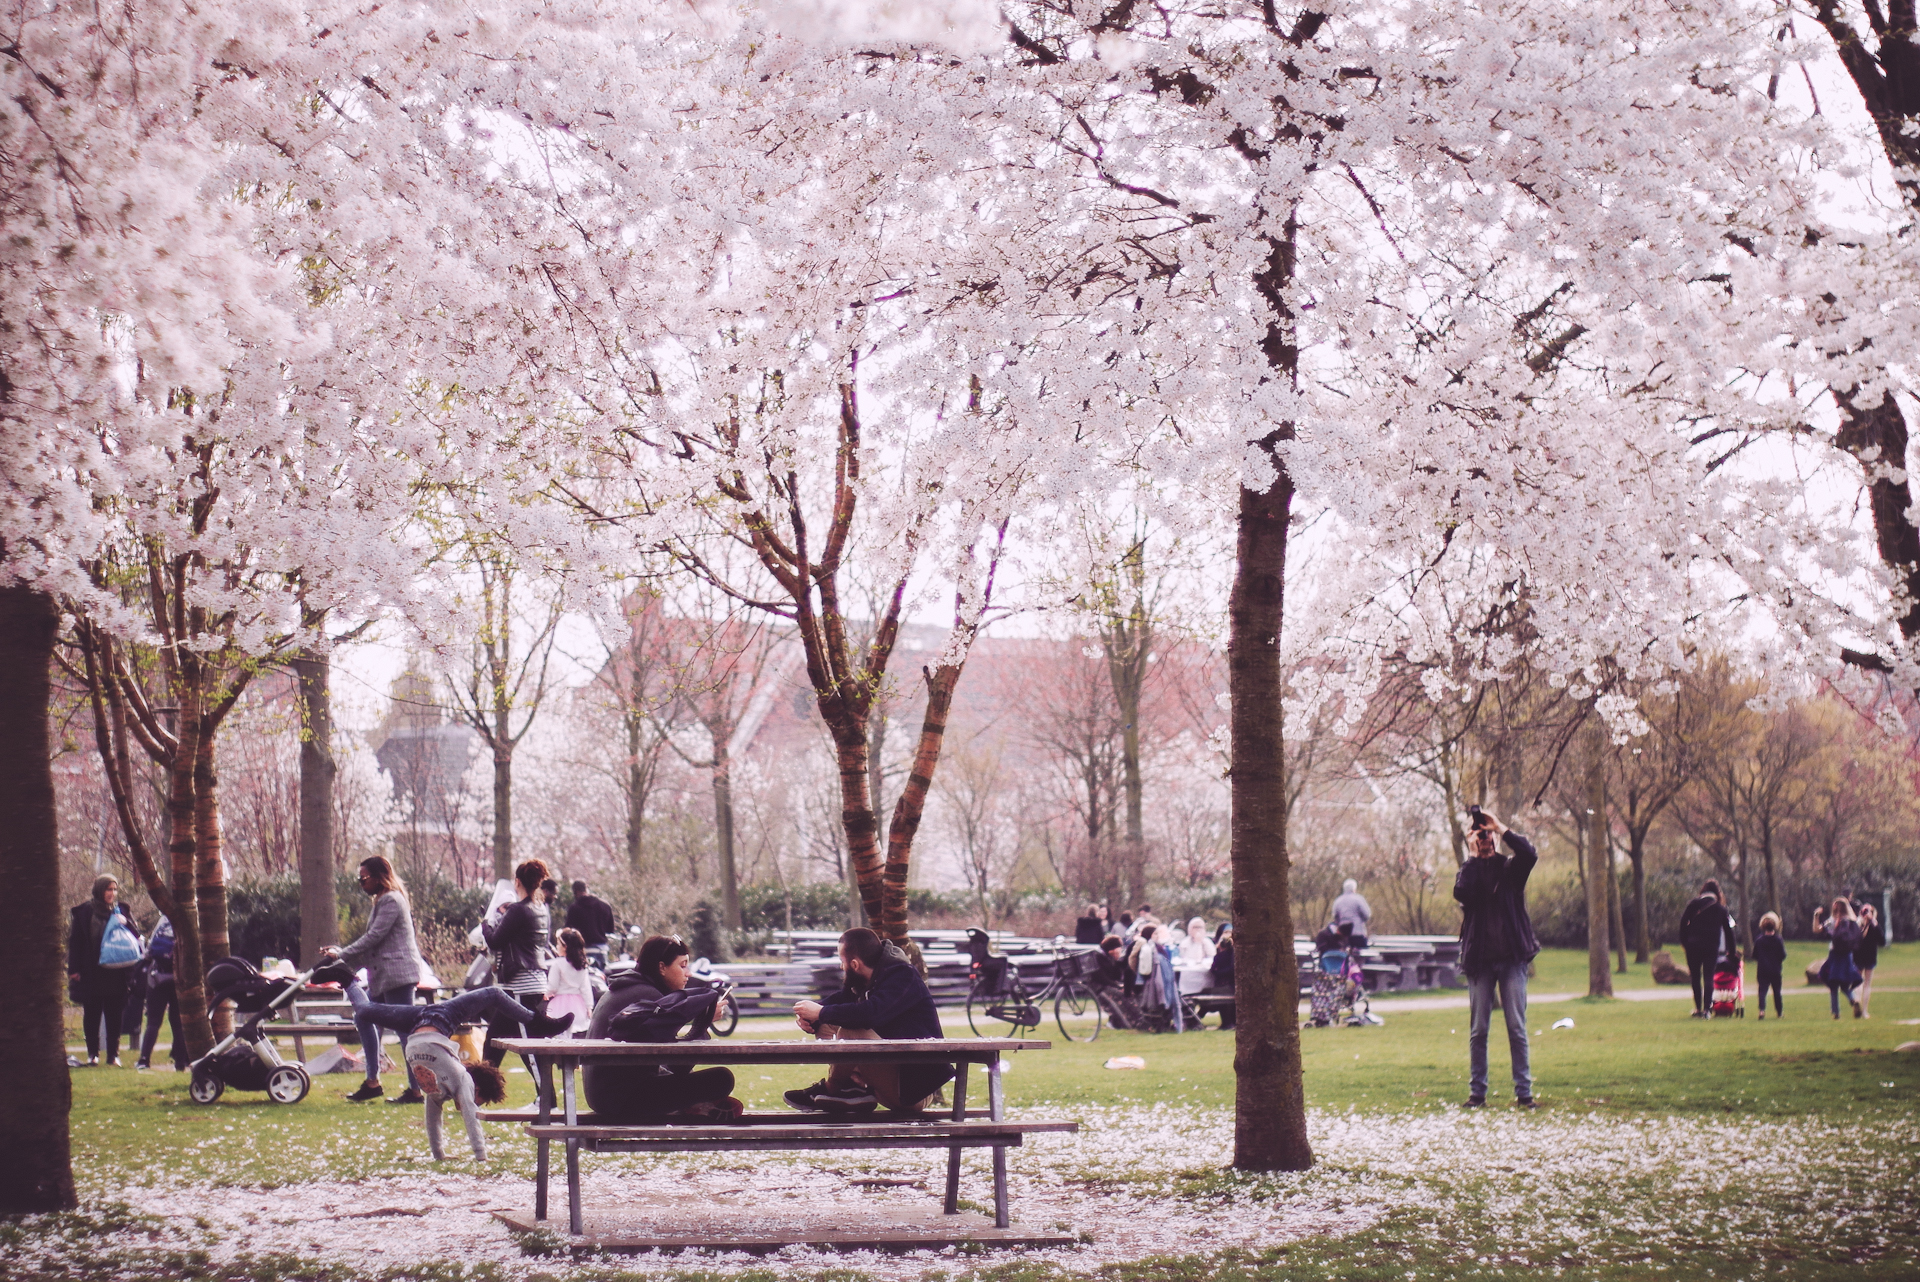 2018 APR Amsterdam Cherry Blossom Pink le-12.jpg